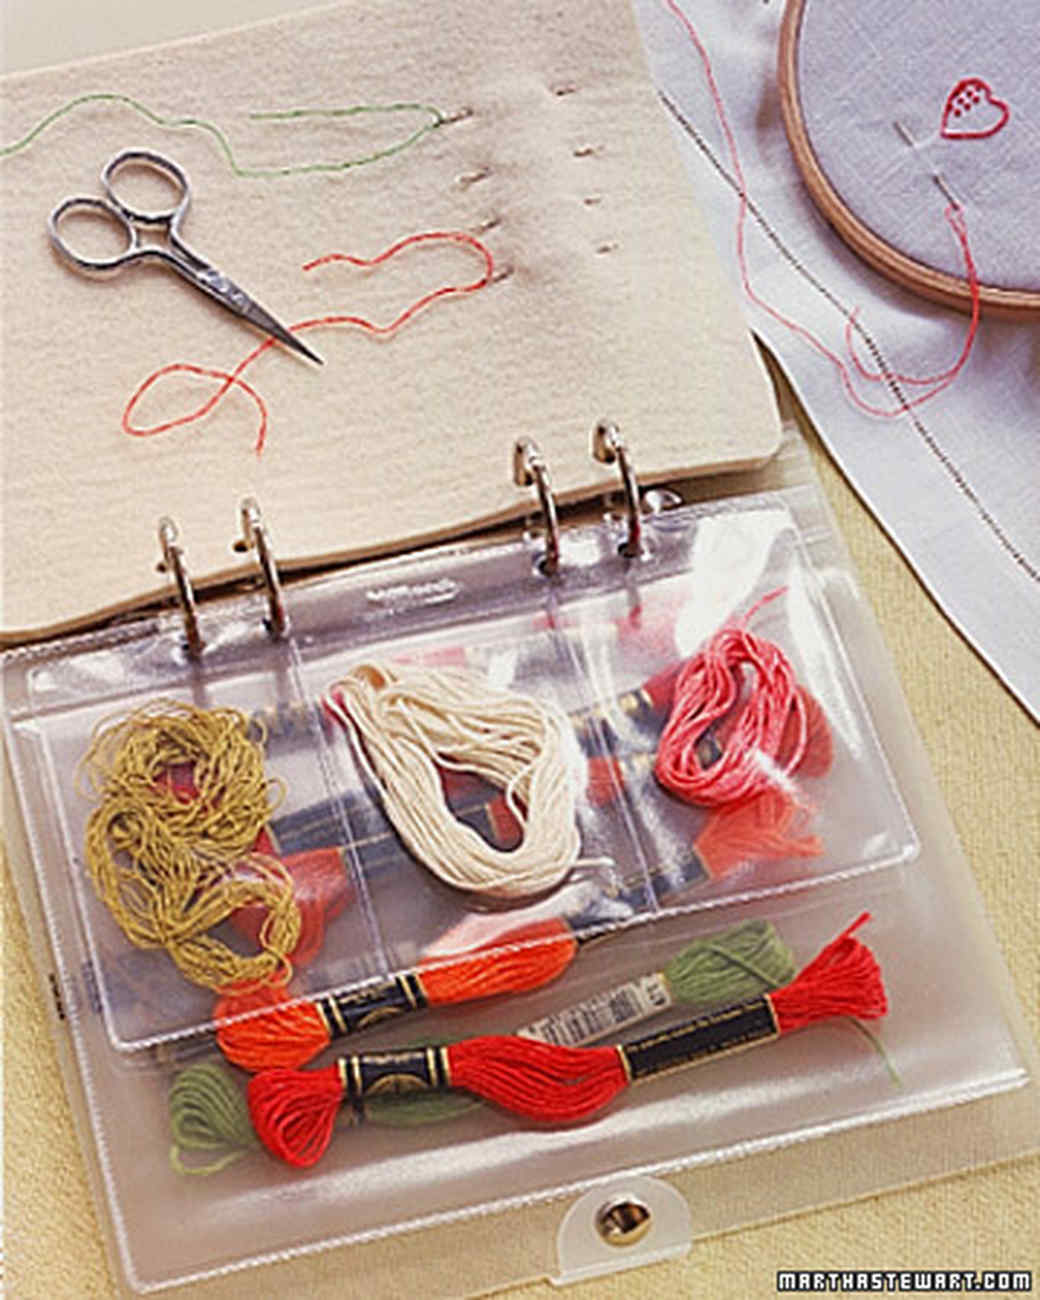 Embroidery Organizer